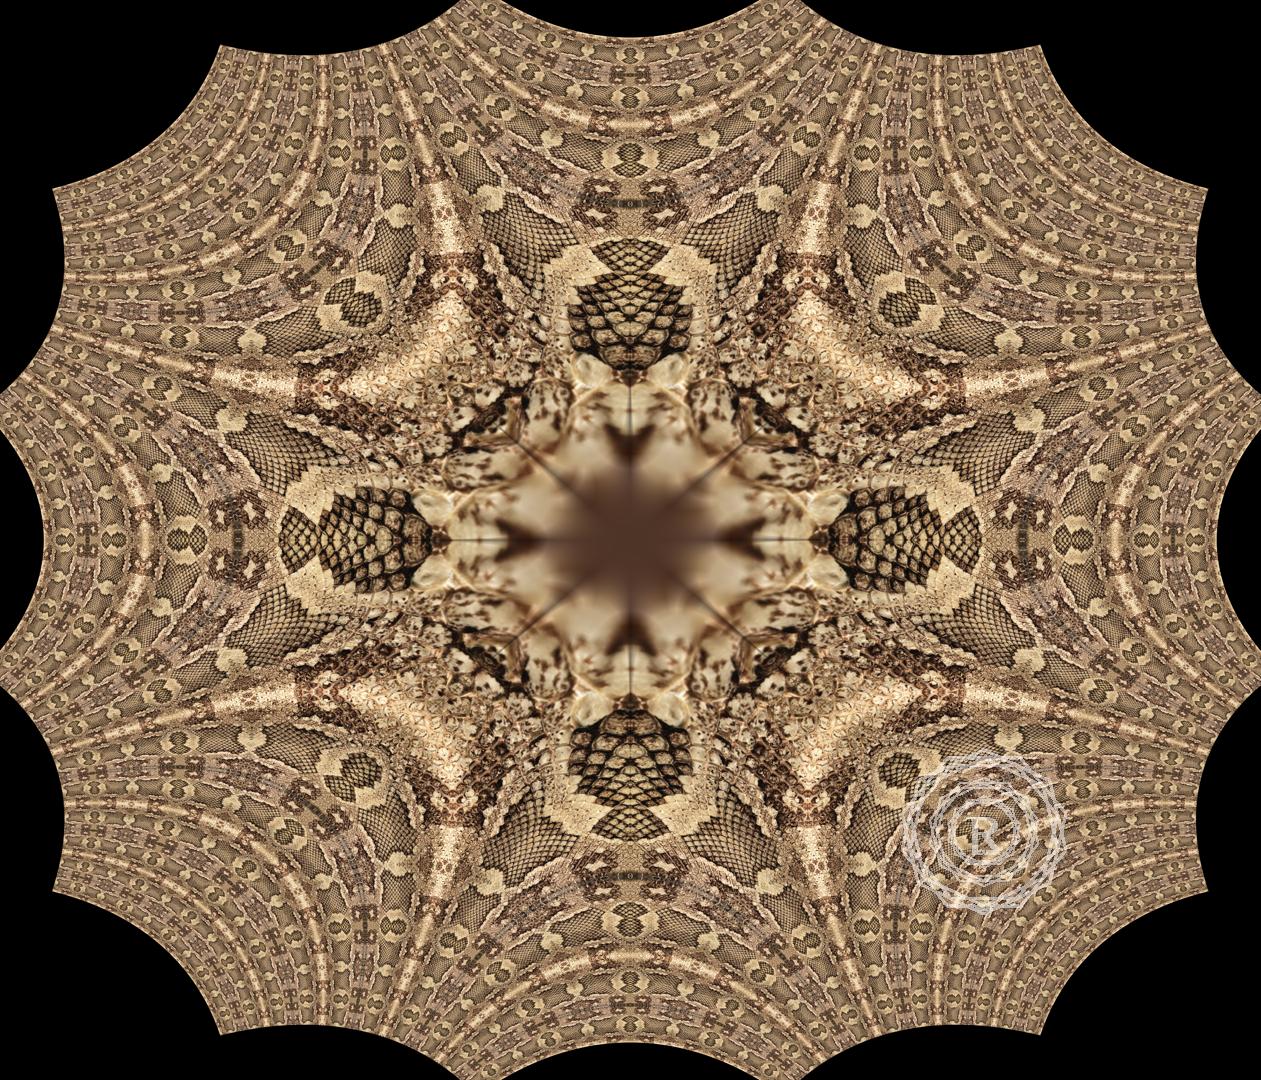 00074Resized_Mandalas_copyright_Recursia